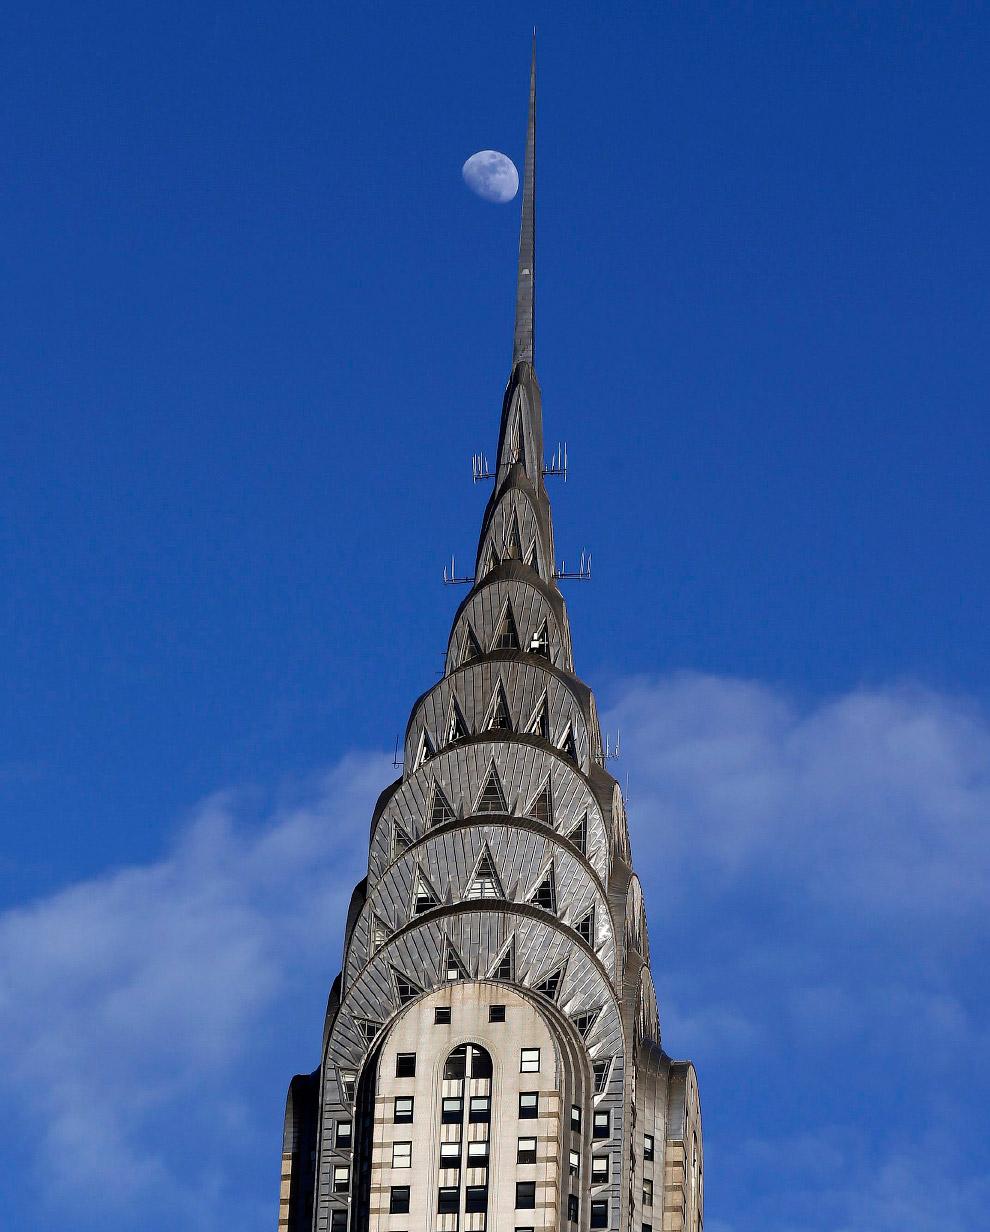 Луна над Крайслер-билдинг в центре Манхэттена в Нью-Йорке, США